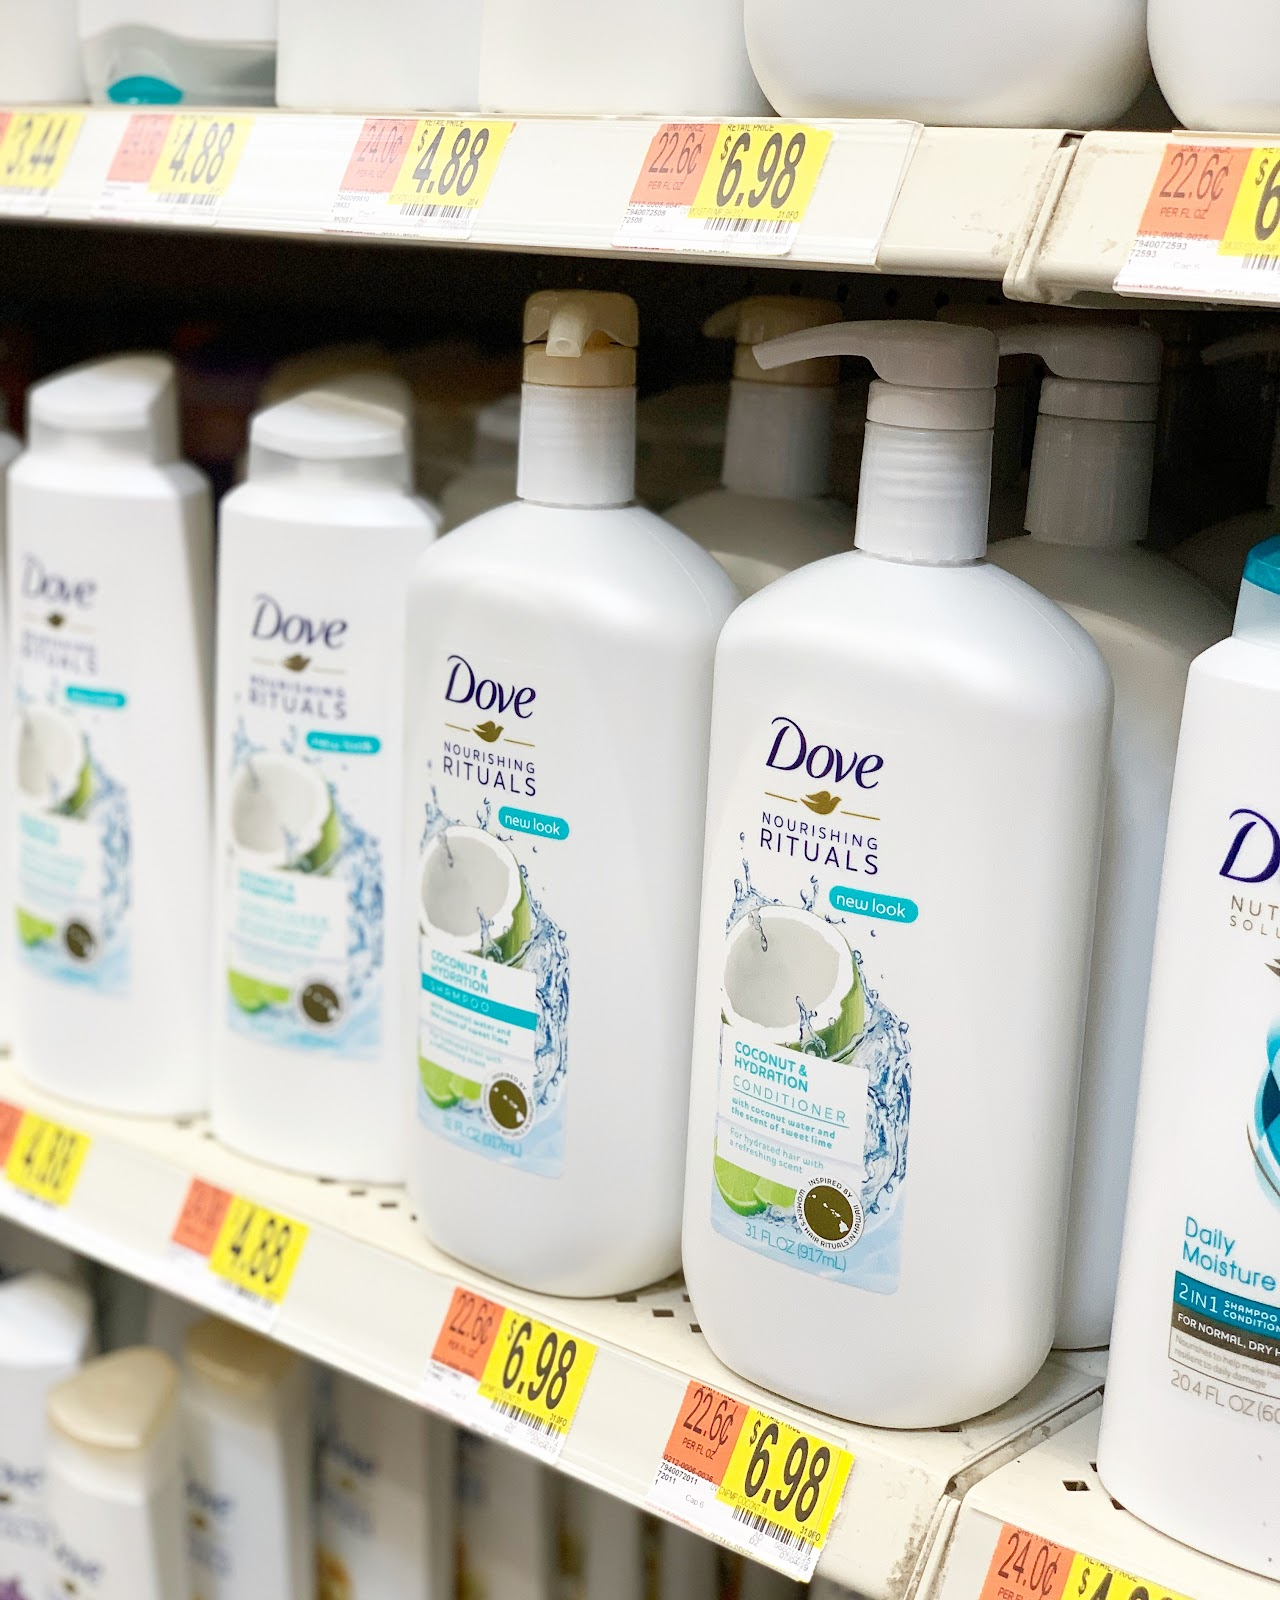 Dove nourishing rituals shampoo and conditioner at walmart